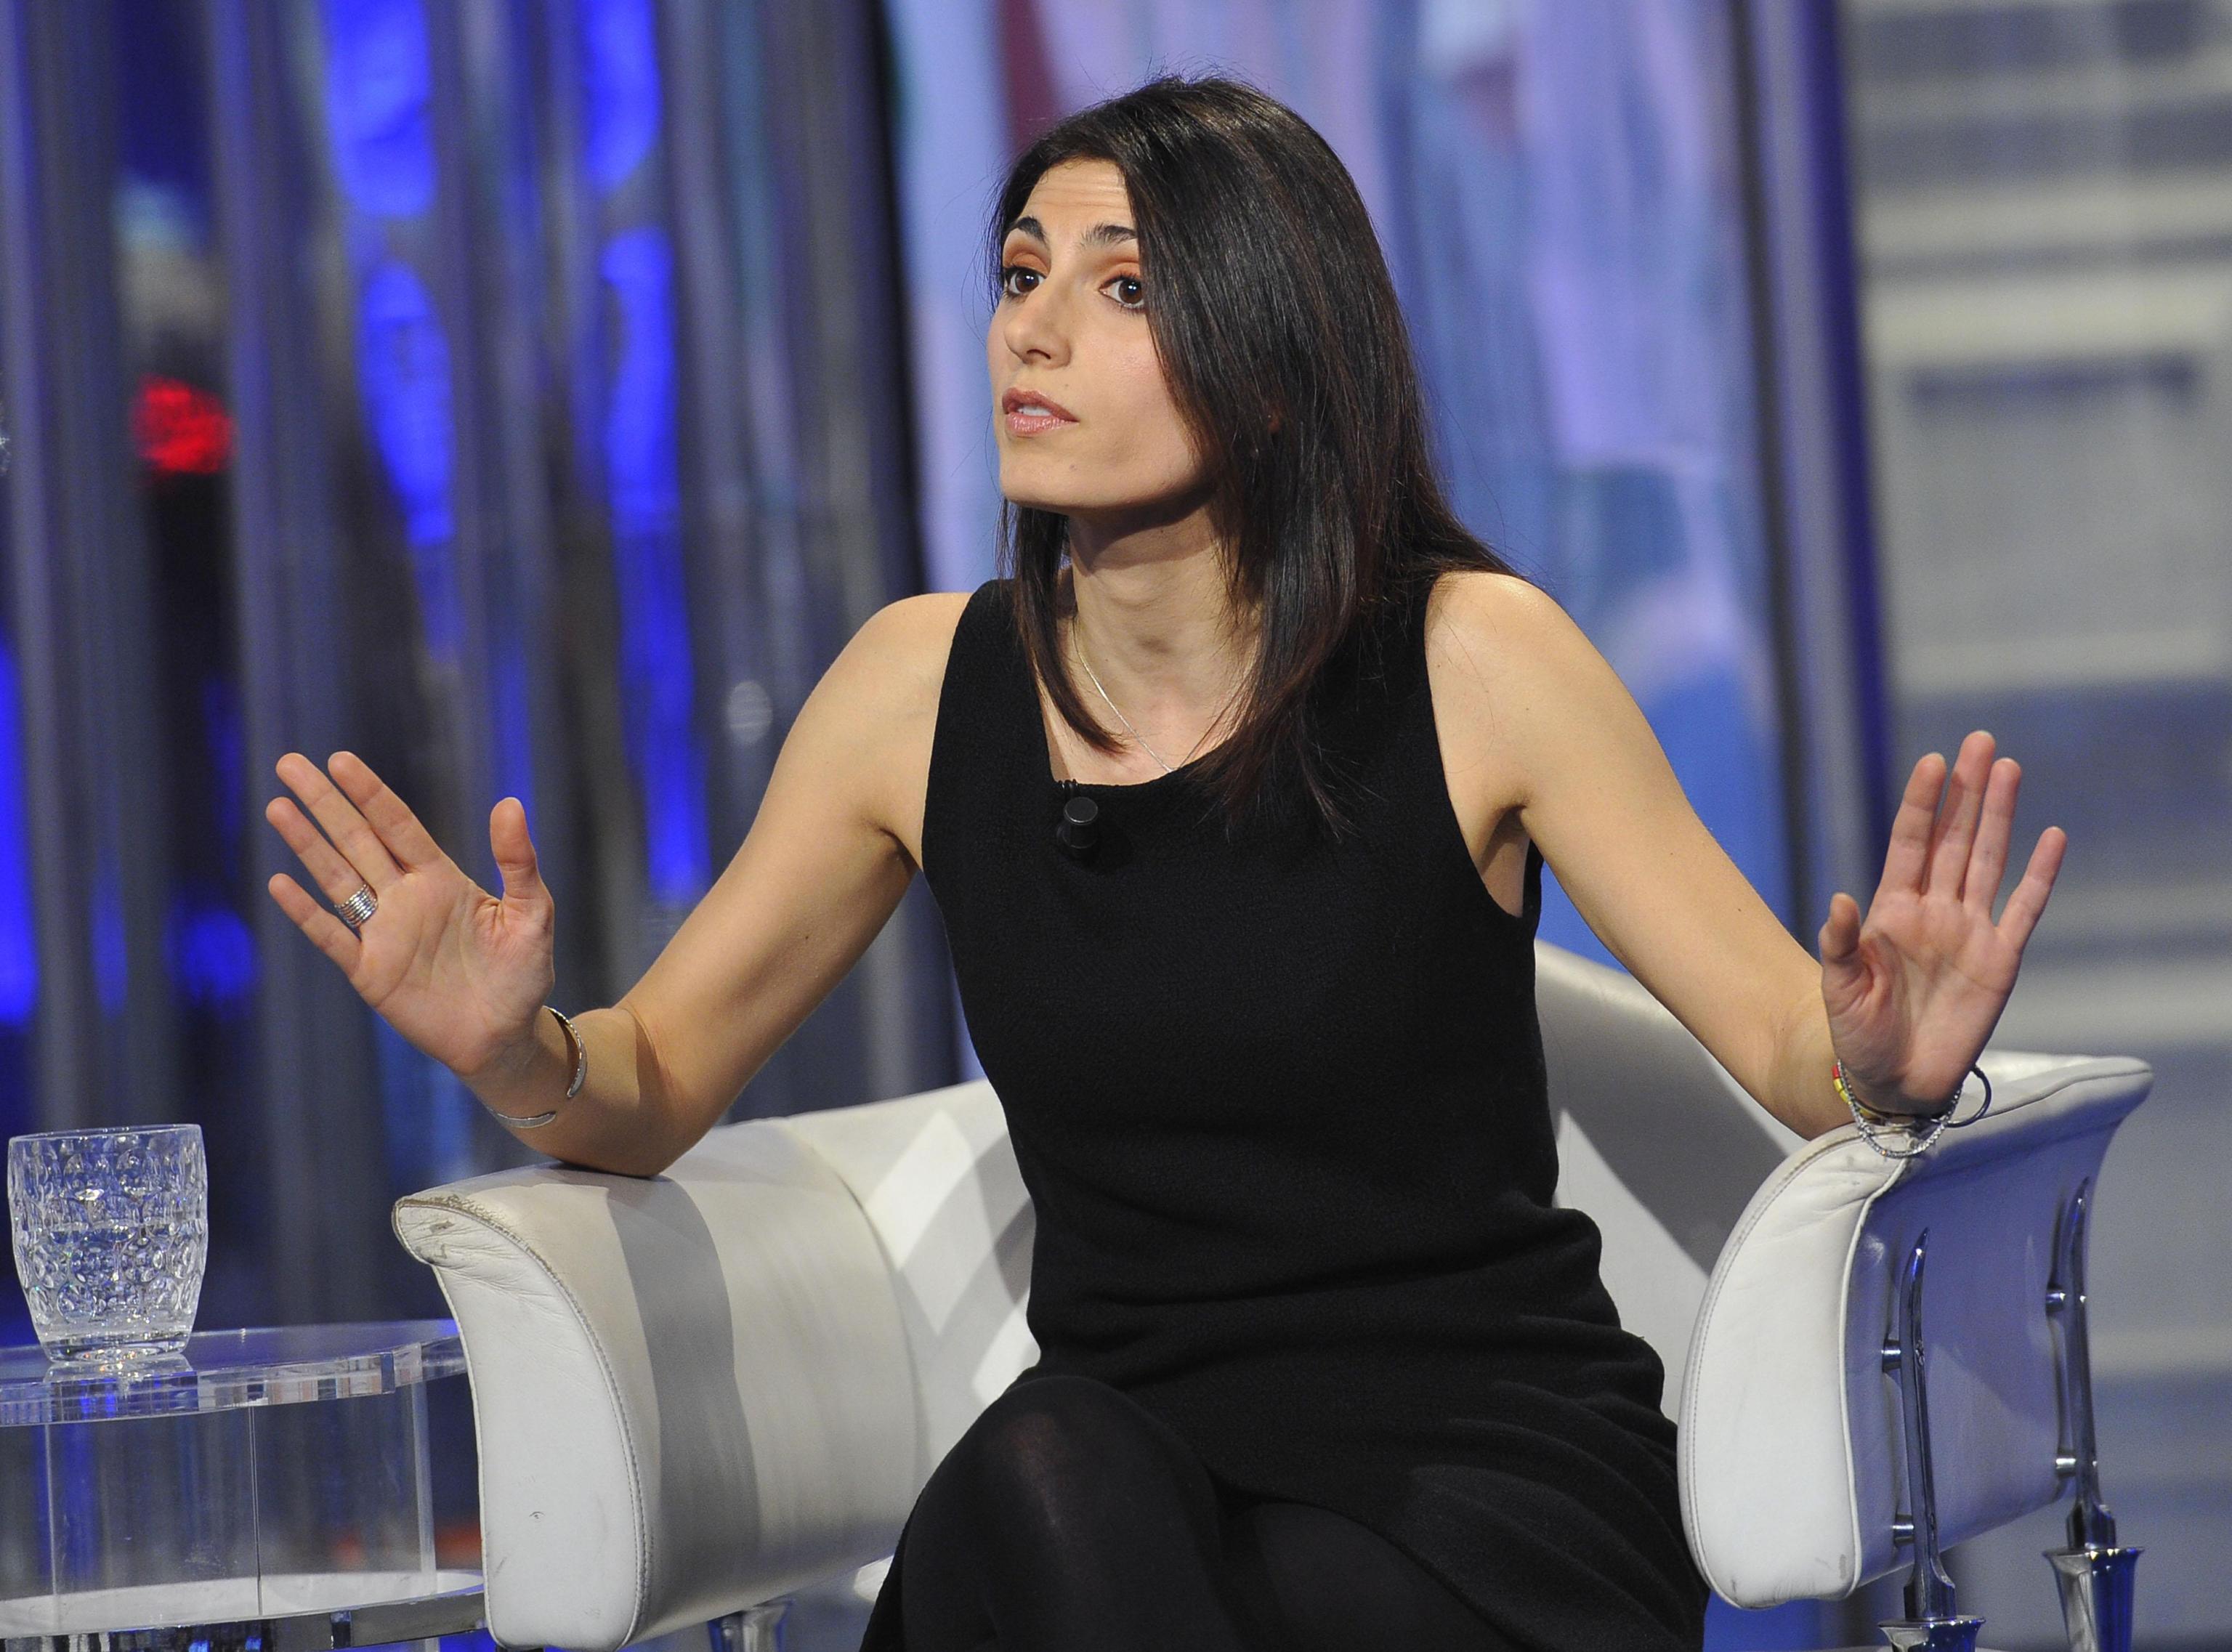 Maria Elena Boschi-Virginia Raggi: look a confronto FOTO ...